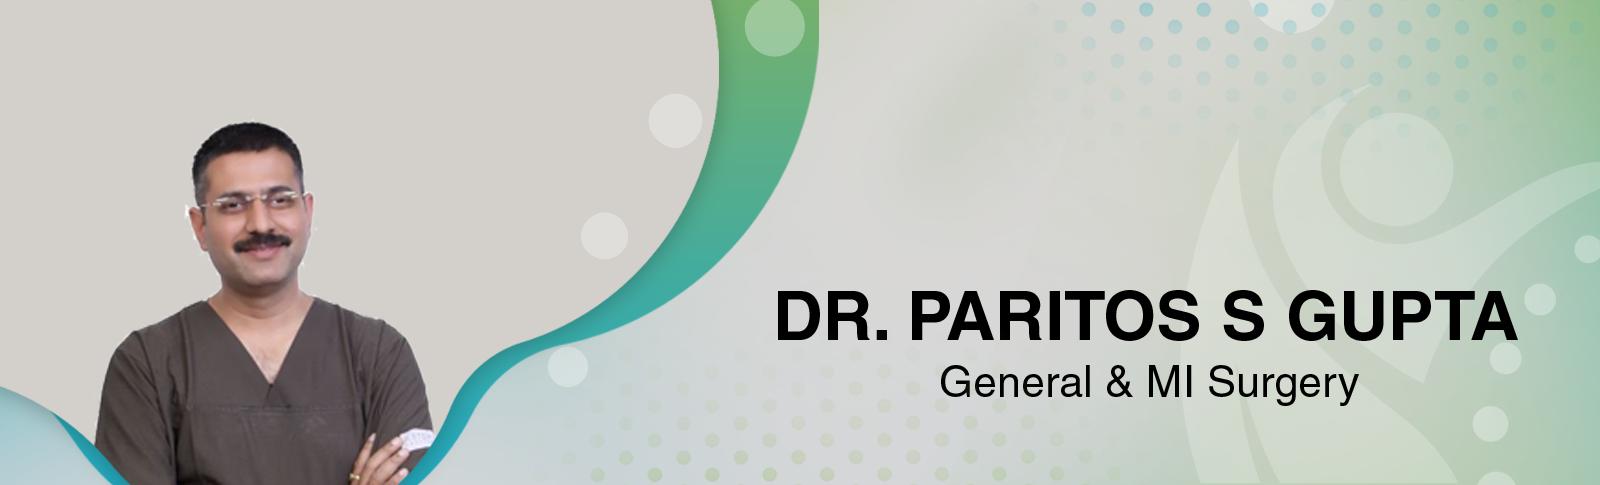 Dr. PARITOSH S GUPTA